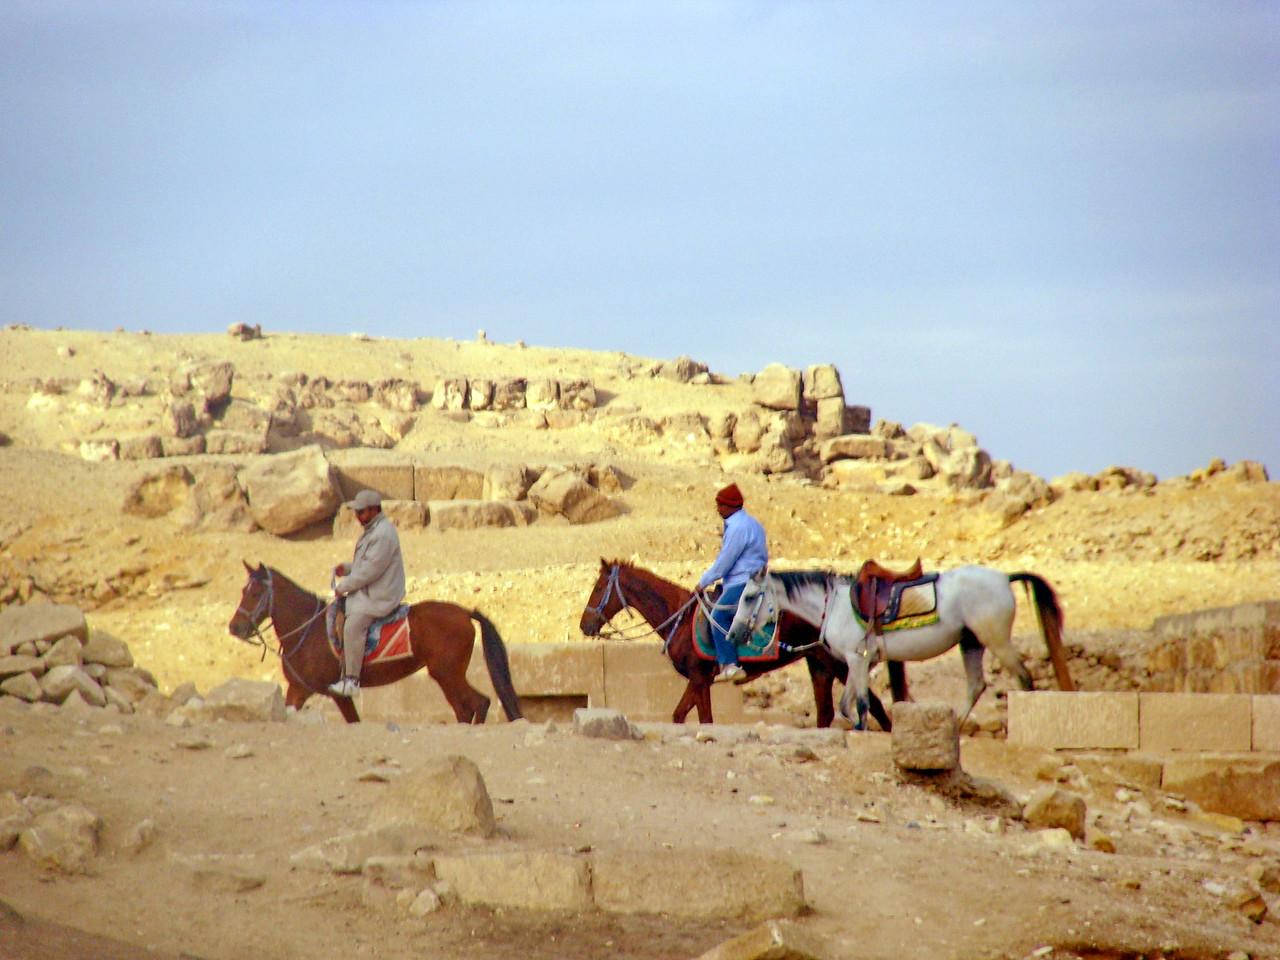 Horse Riding at the Pyramids